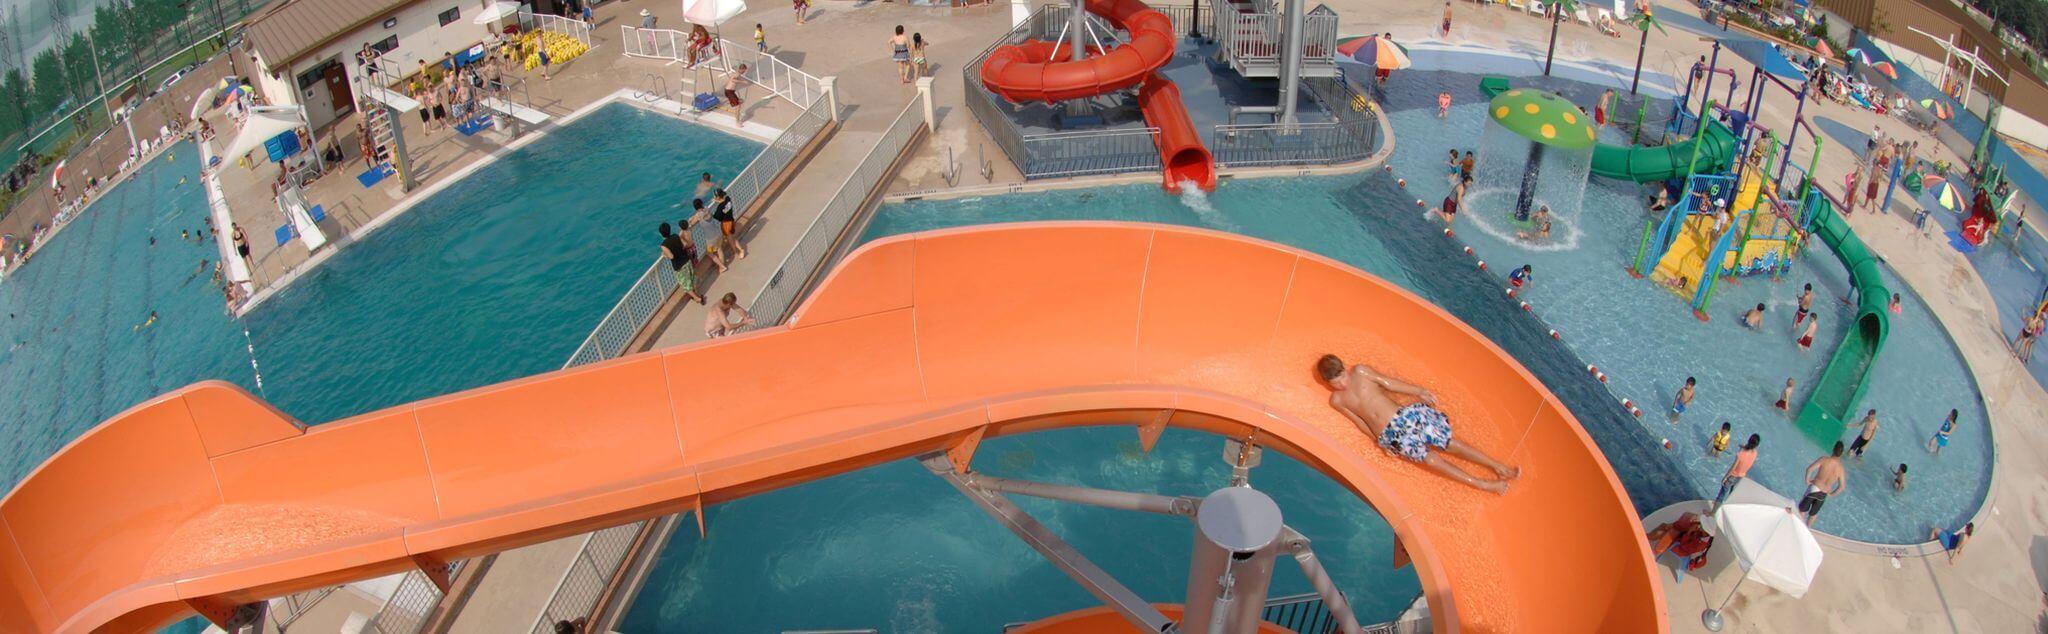 Parcs Aquatiques dans Oloron Sainte Marie